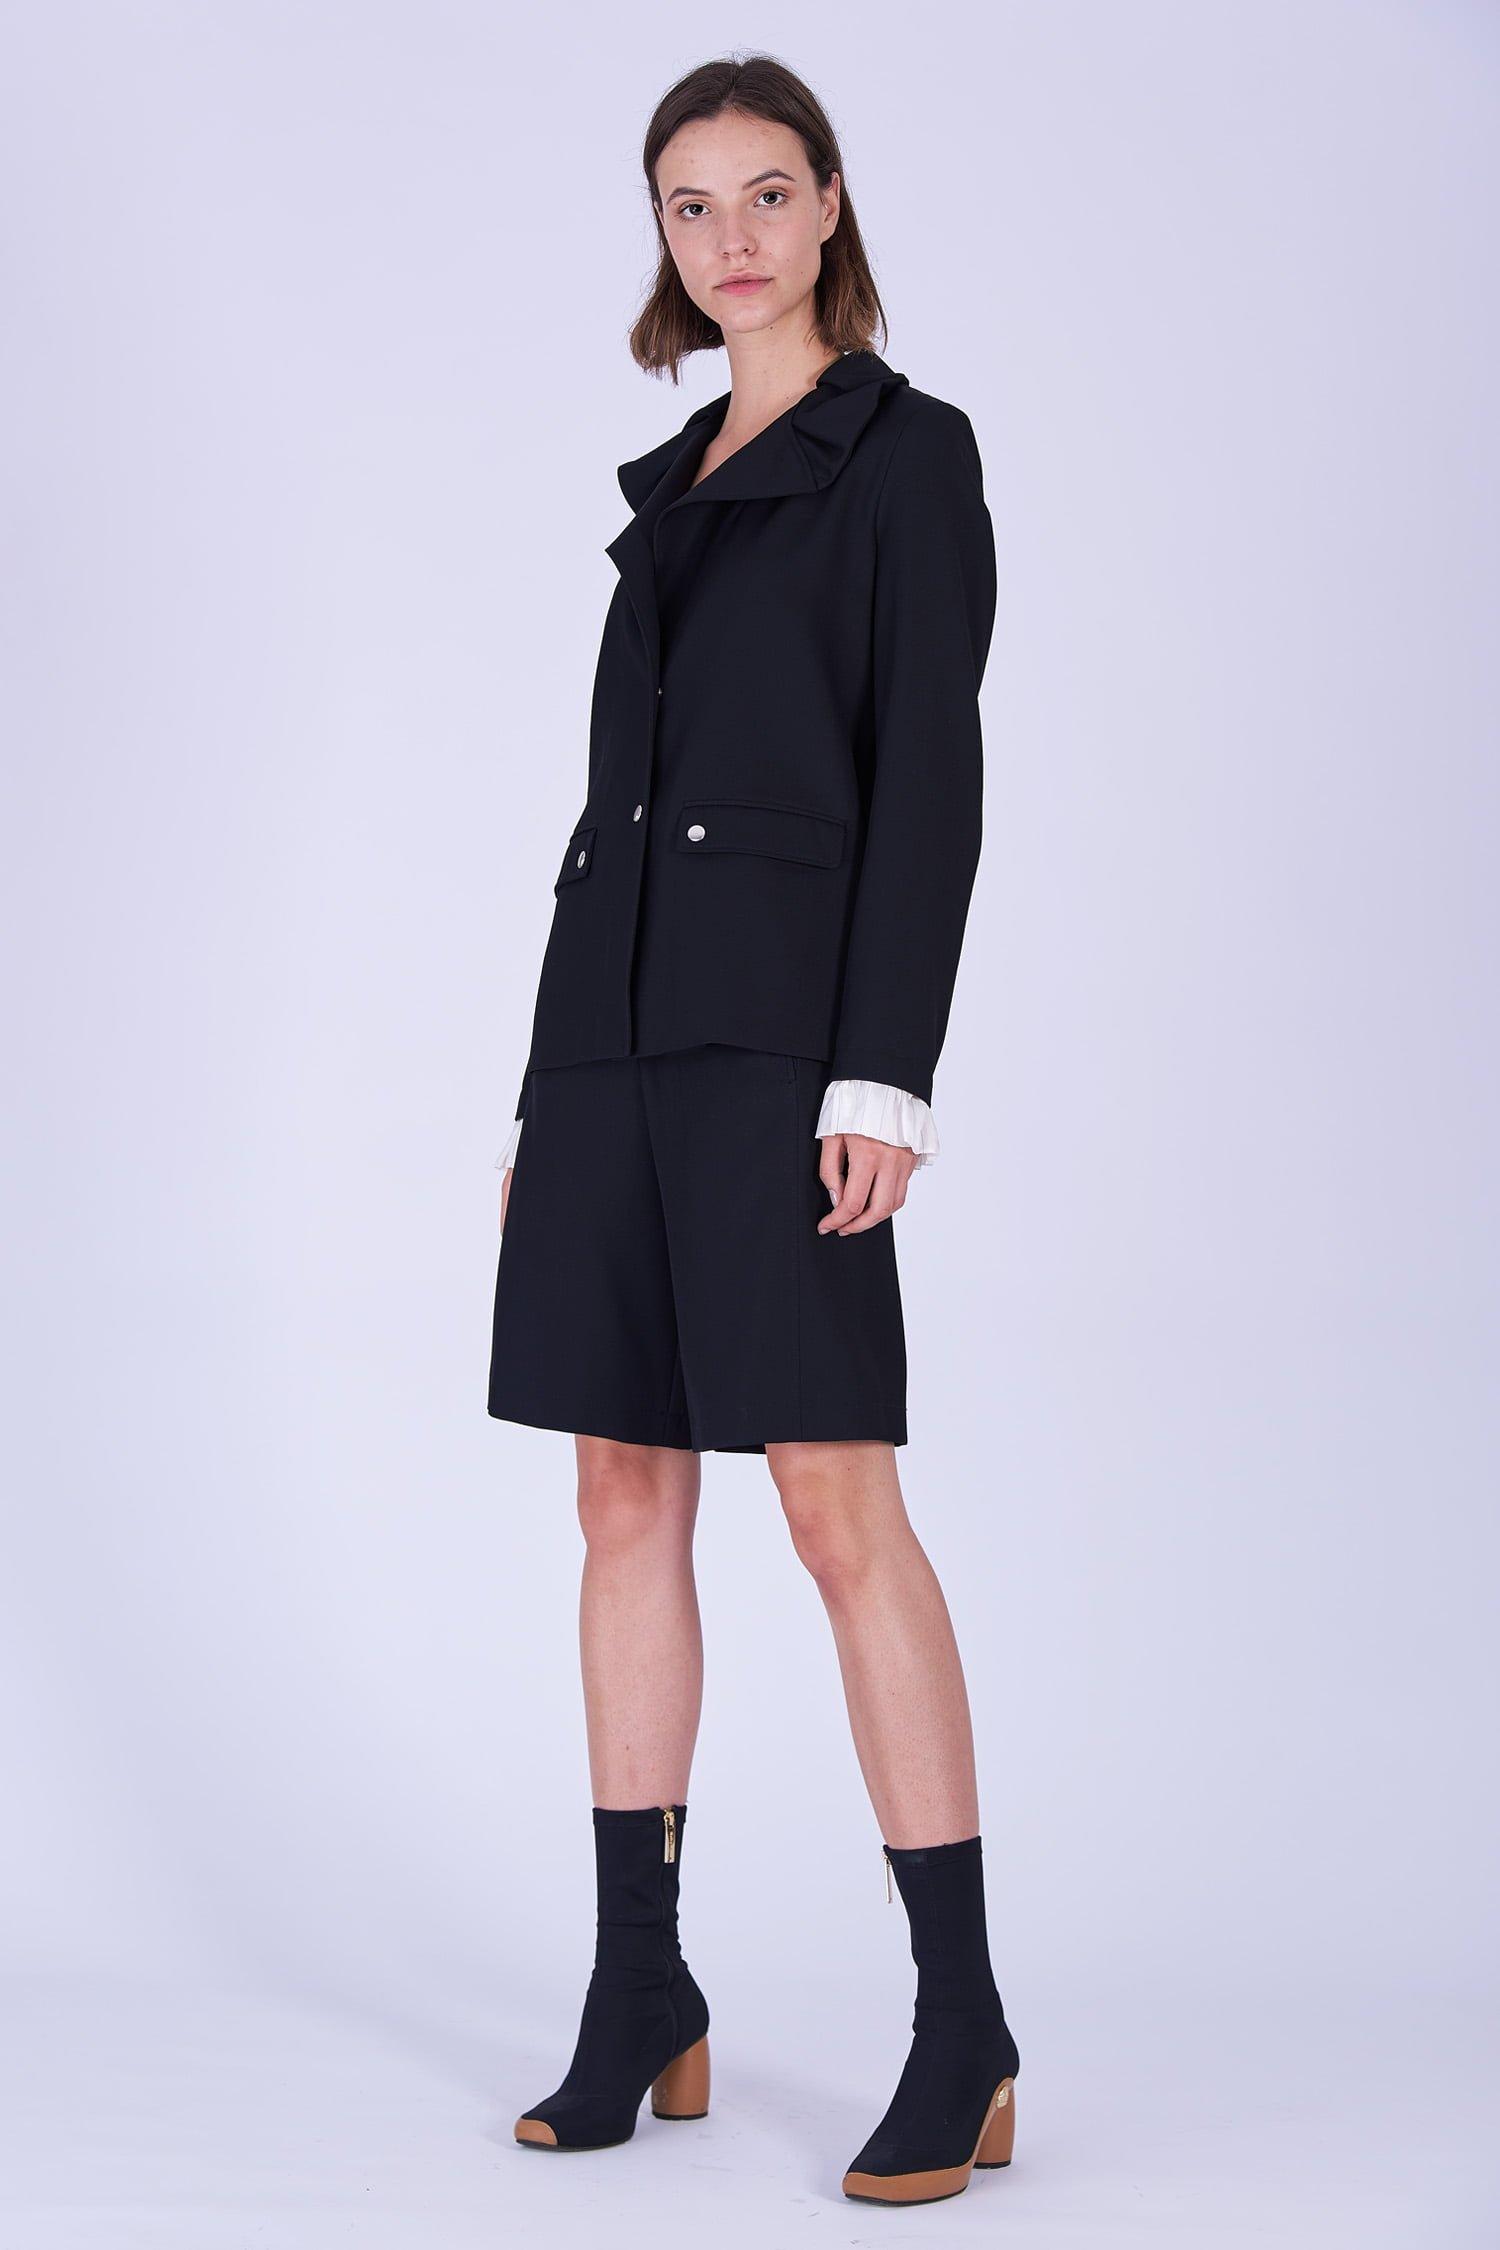 Acephala Fw19 20 Black Jacket Black Shorts Wool Czarna Kamizelka Czarne Szorty Welna Side 2